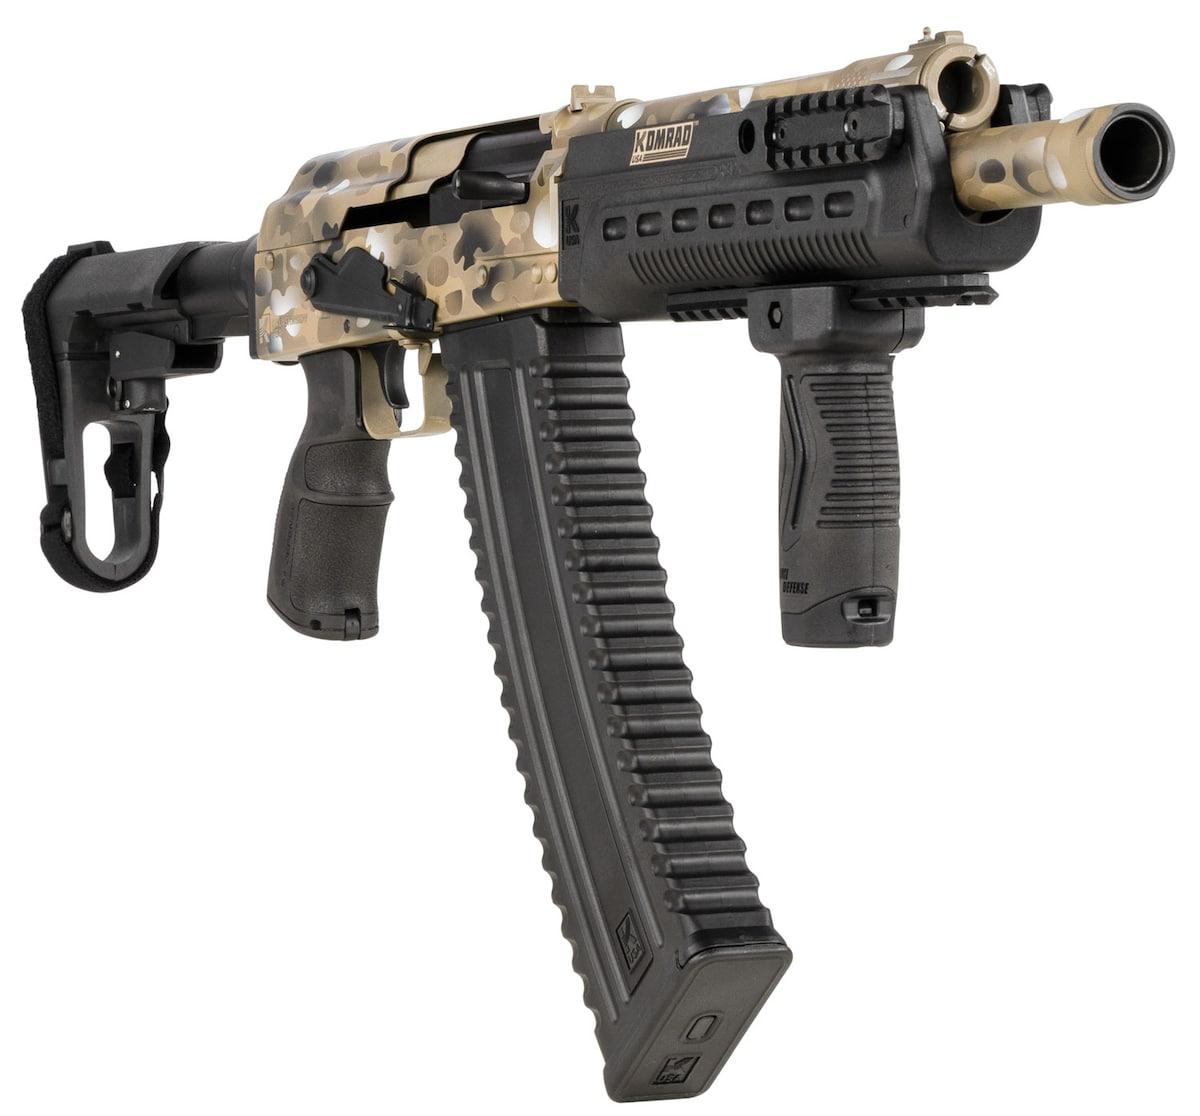 Kalashnikov Usa Komrad - For Sale - New :: Guns.com